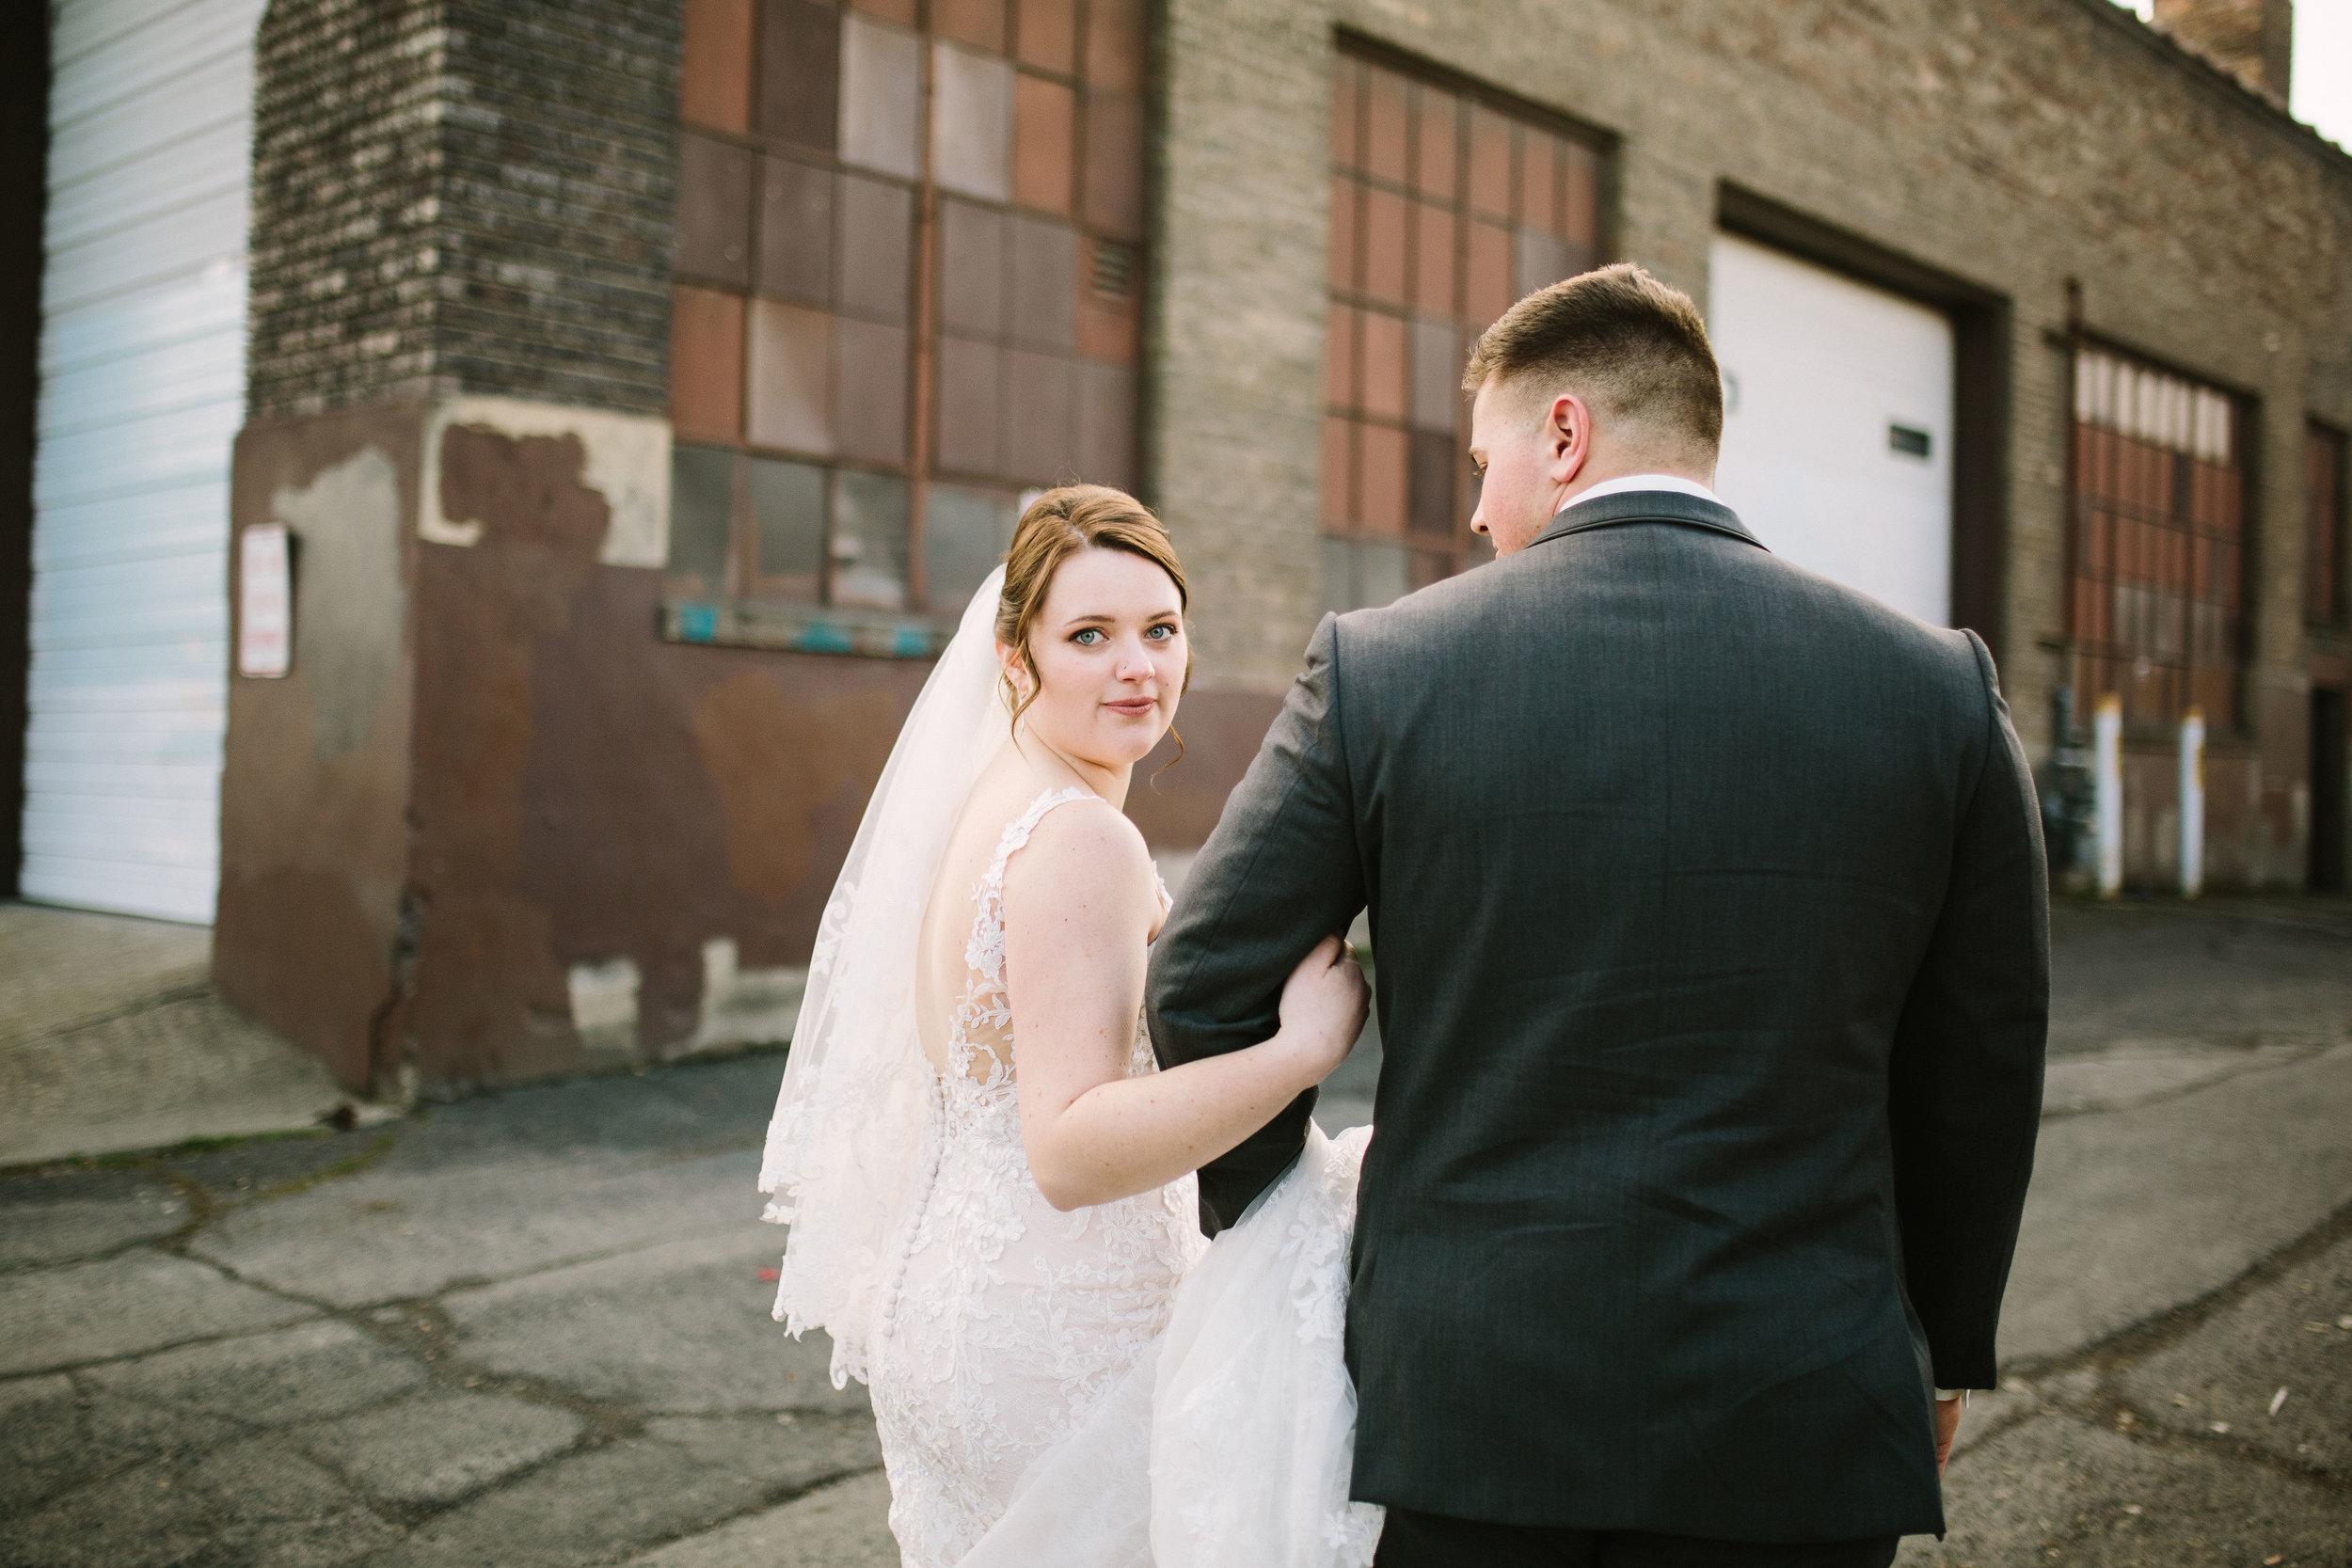 Fun Rustic spokane wedding bride and groom walking away together